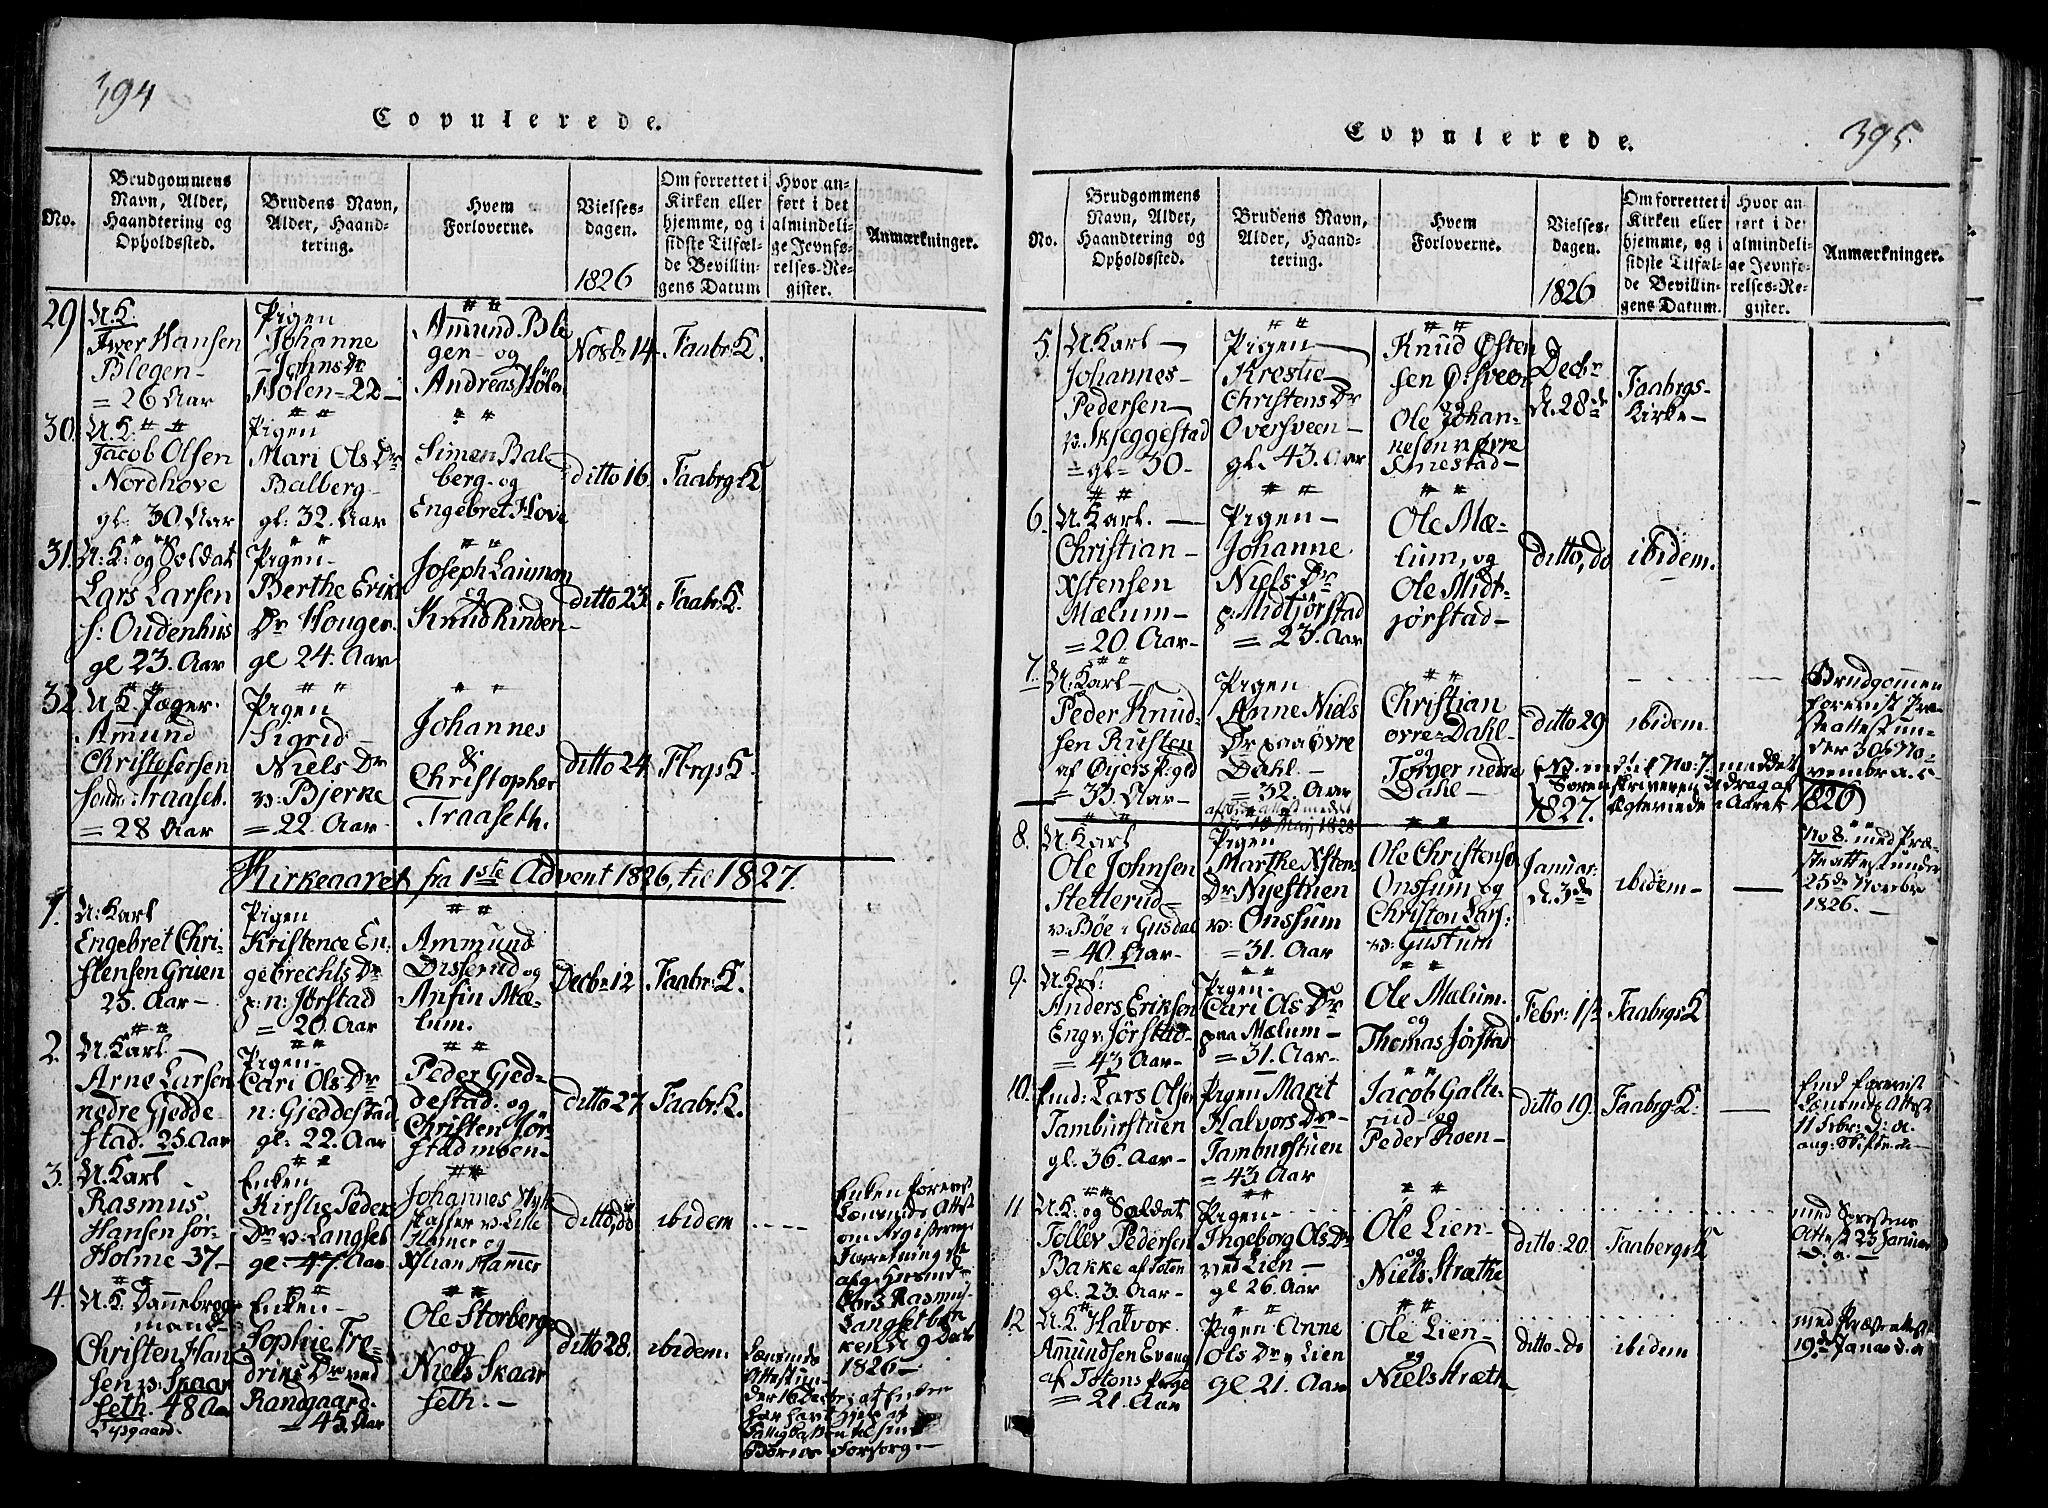 SAH, Fåberg prestekontor, Ministerialbok nr. 3, 1818-1833, s. 394-395